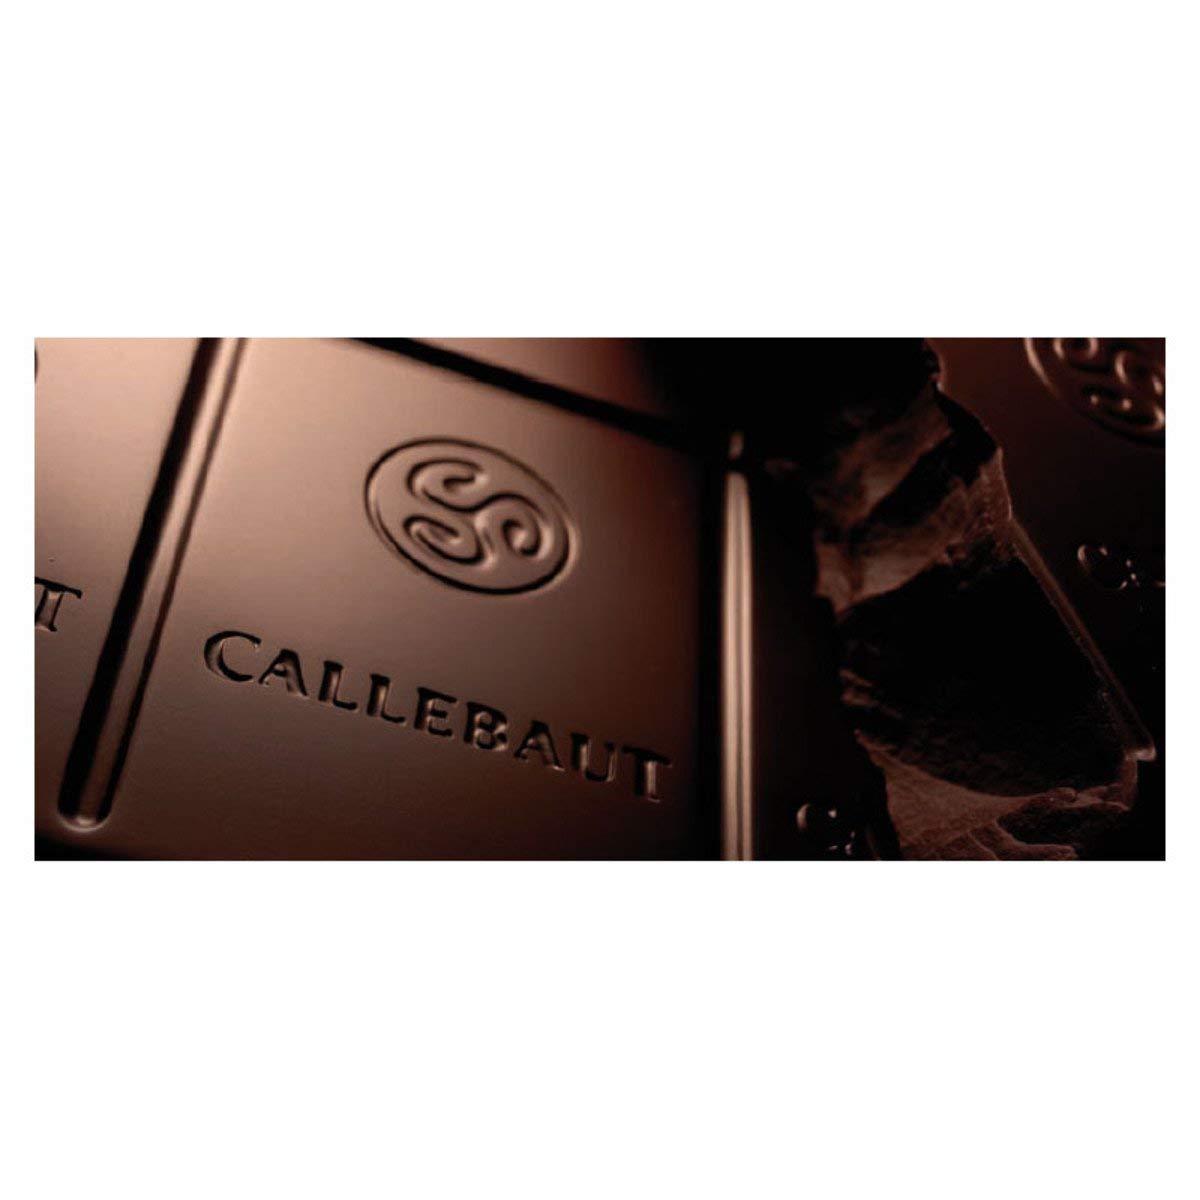 Barry Callebaut Dark Compound Coating (Bulk Case: Five - 11 lb Bars)